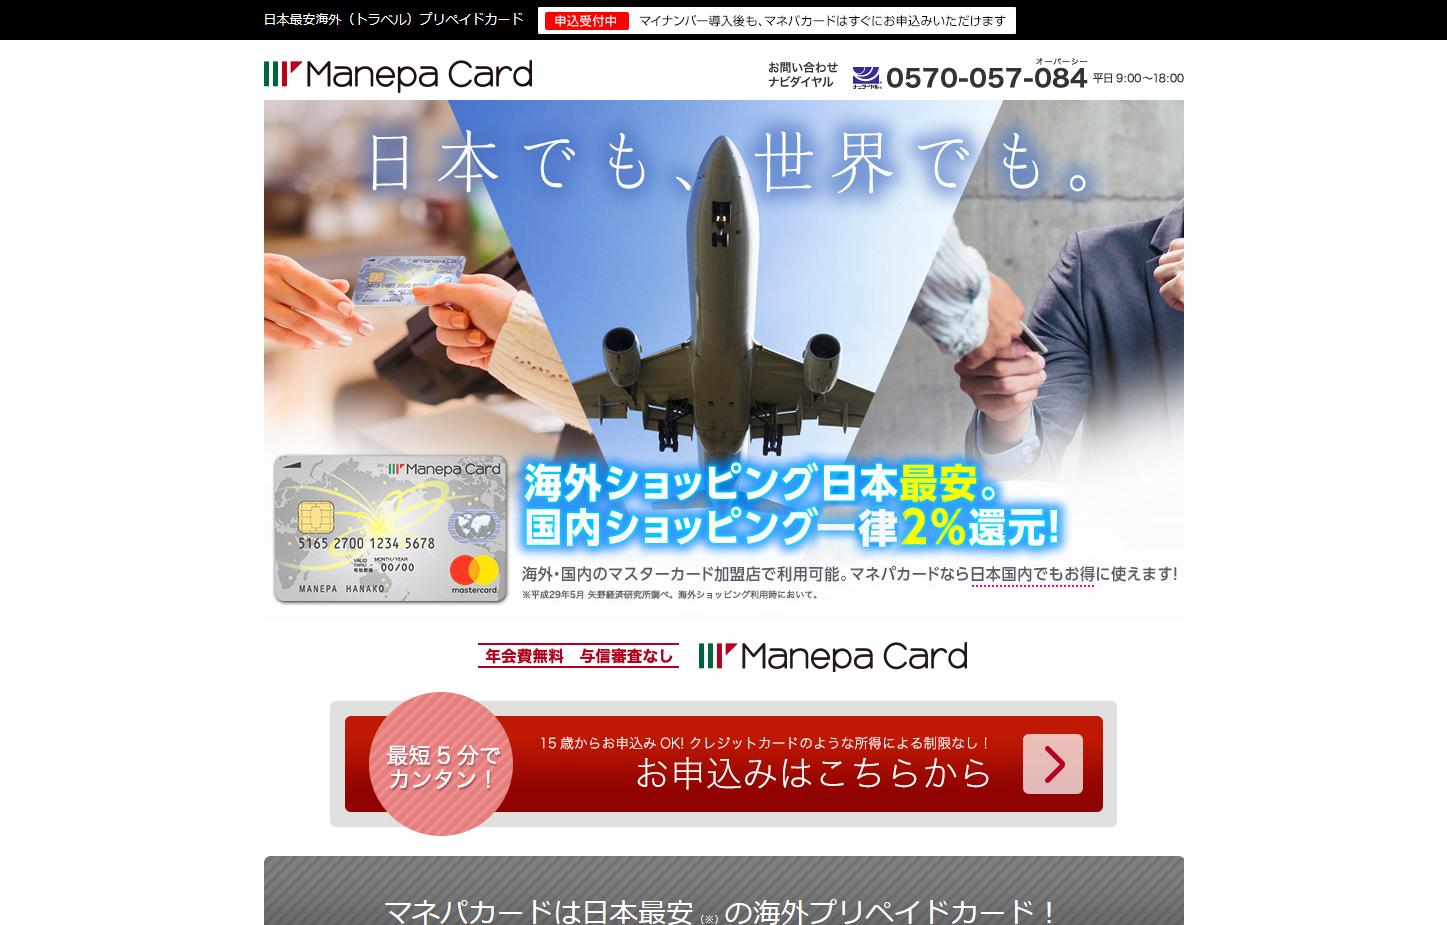 Manepa Card マネパカード